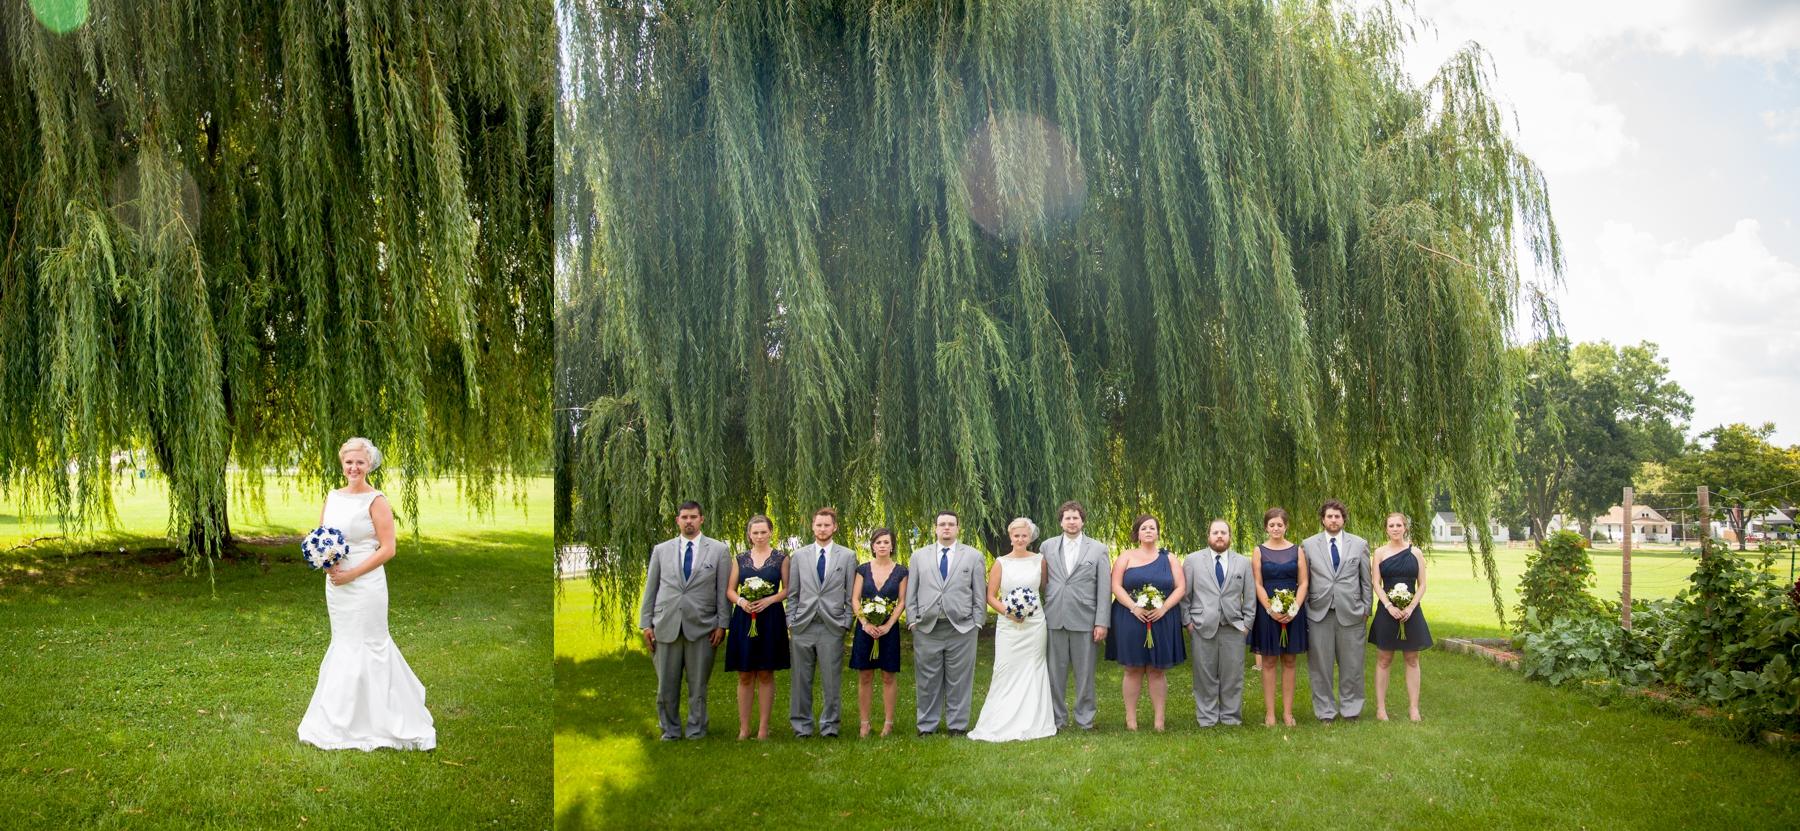 Brandon_Shafer_Photography_Chris_Lauren_Michigan_State_Capital_Wedding_0033.jpg